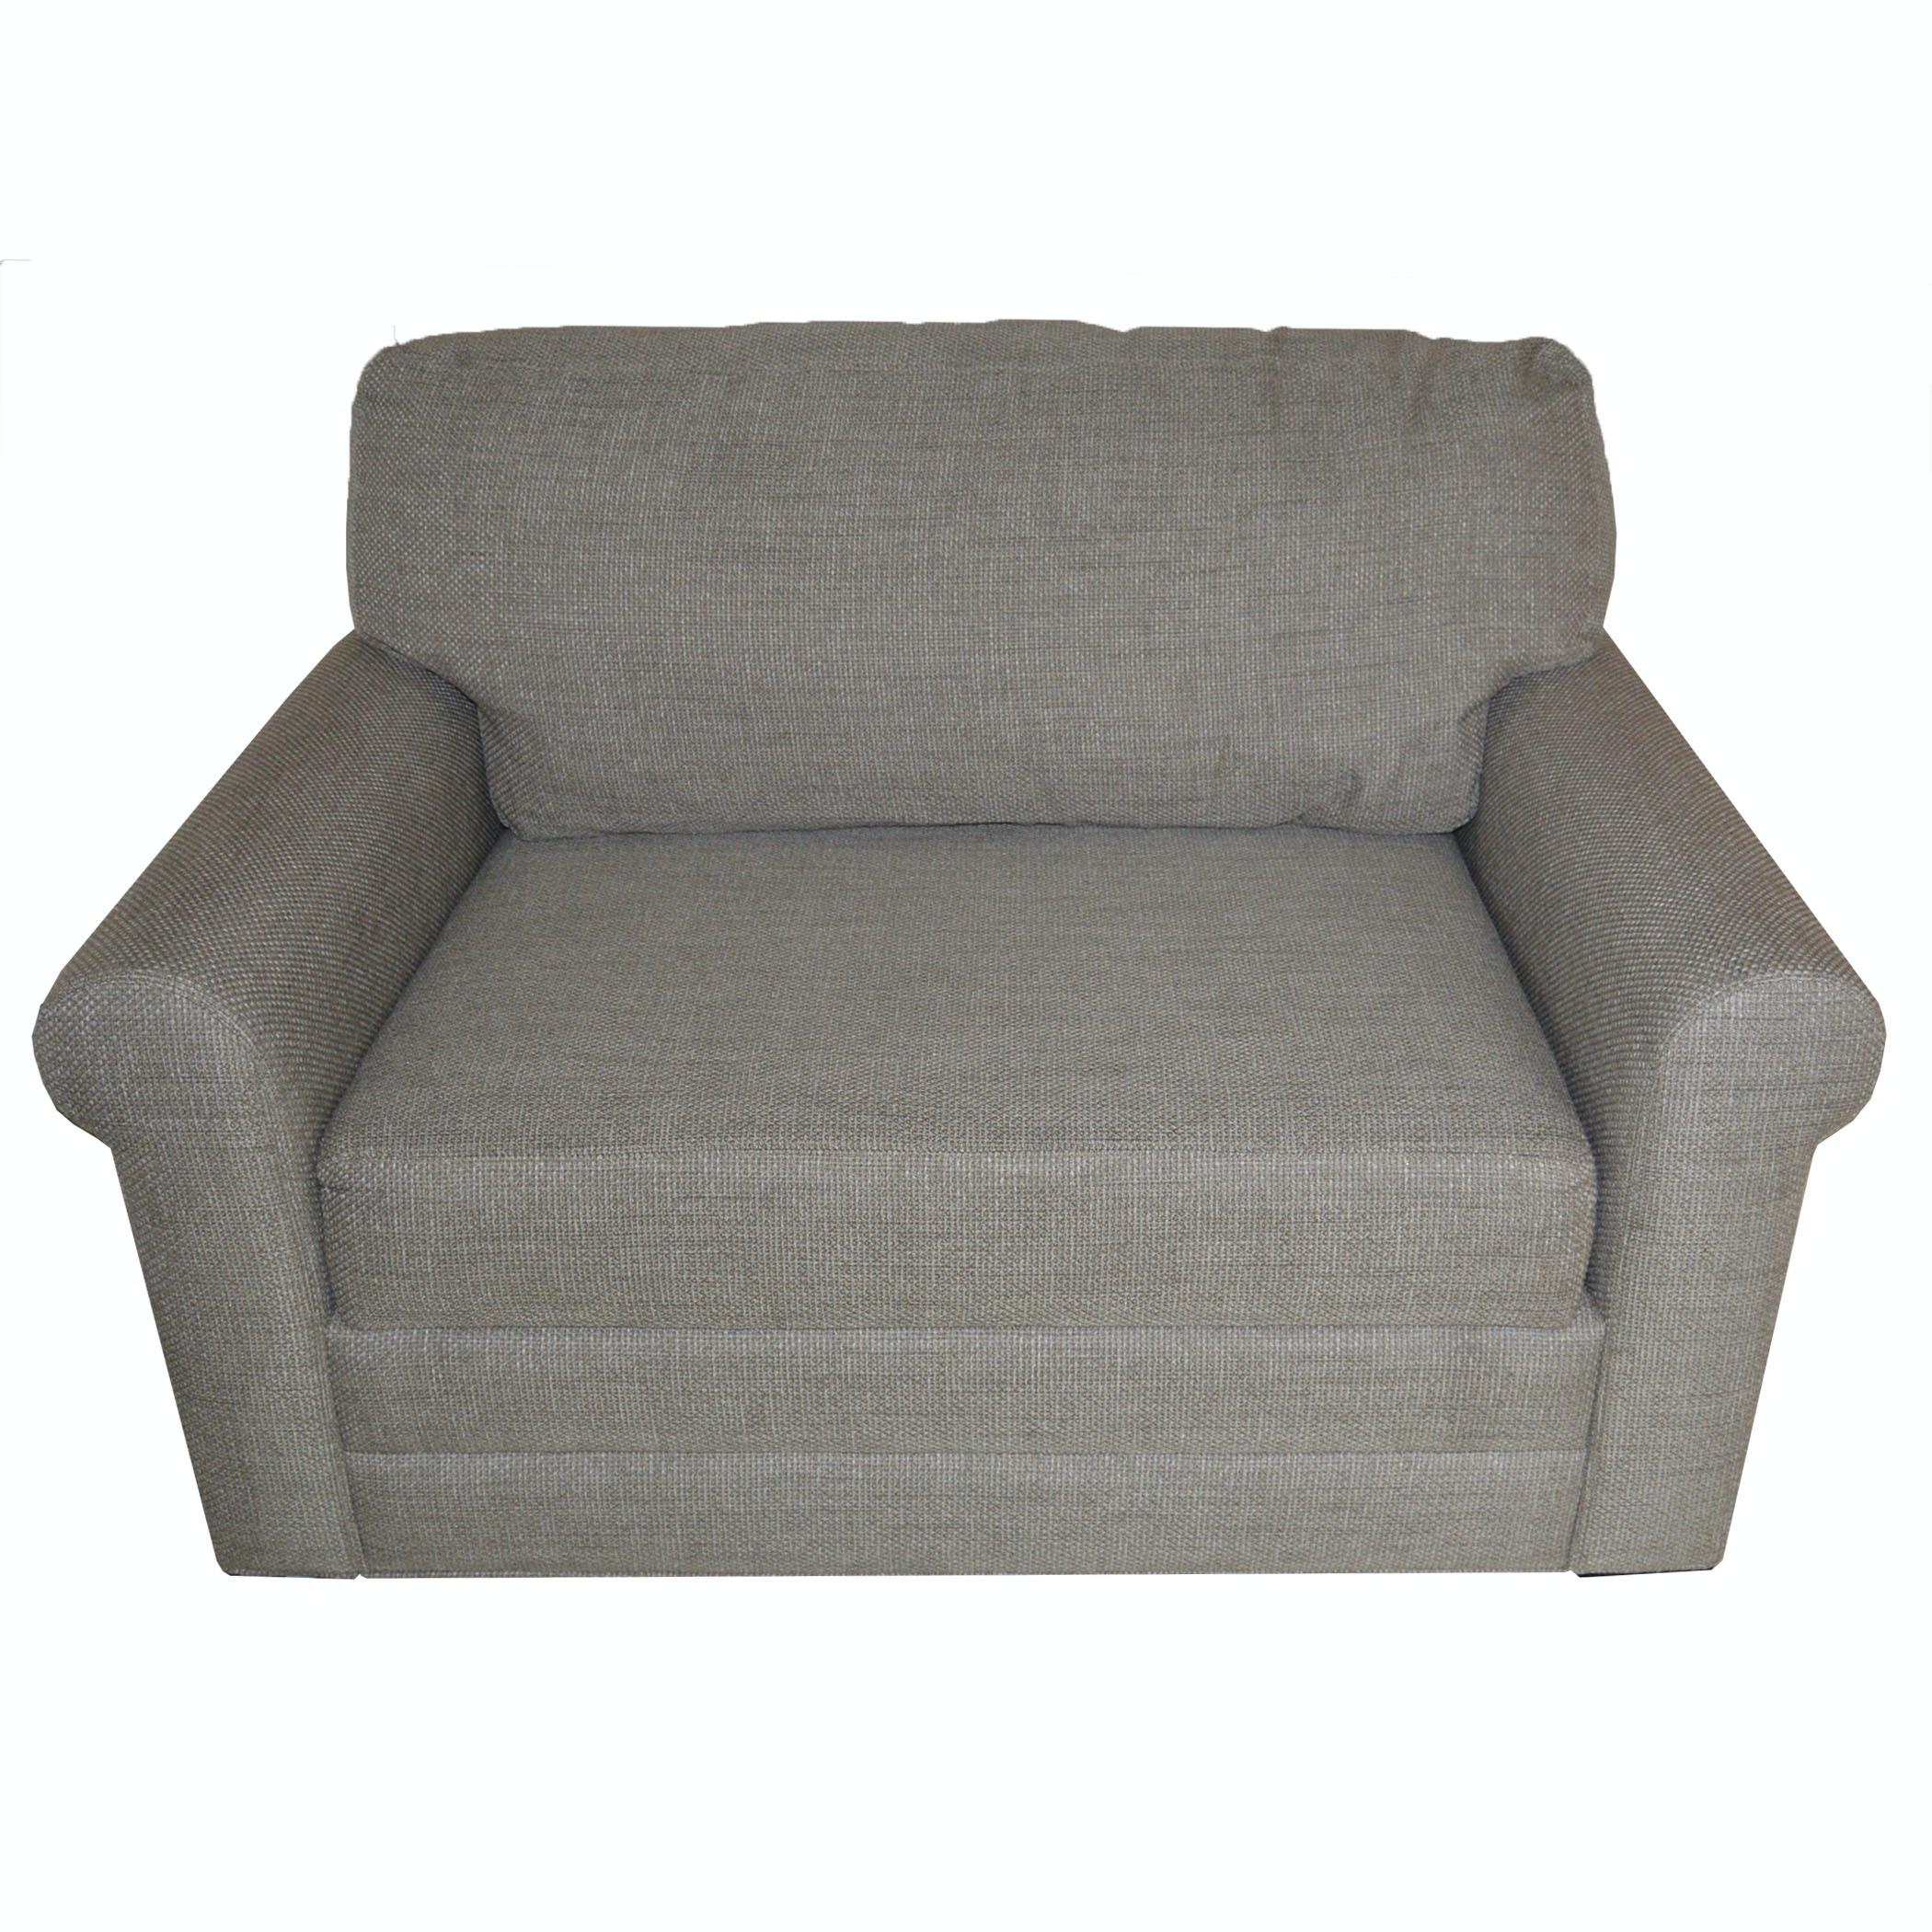 Twin Size Sleeper Chair From Crate U0026 Barrel ...